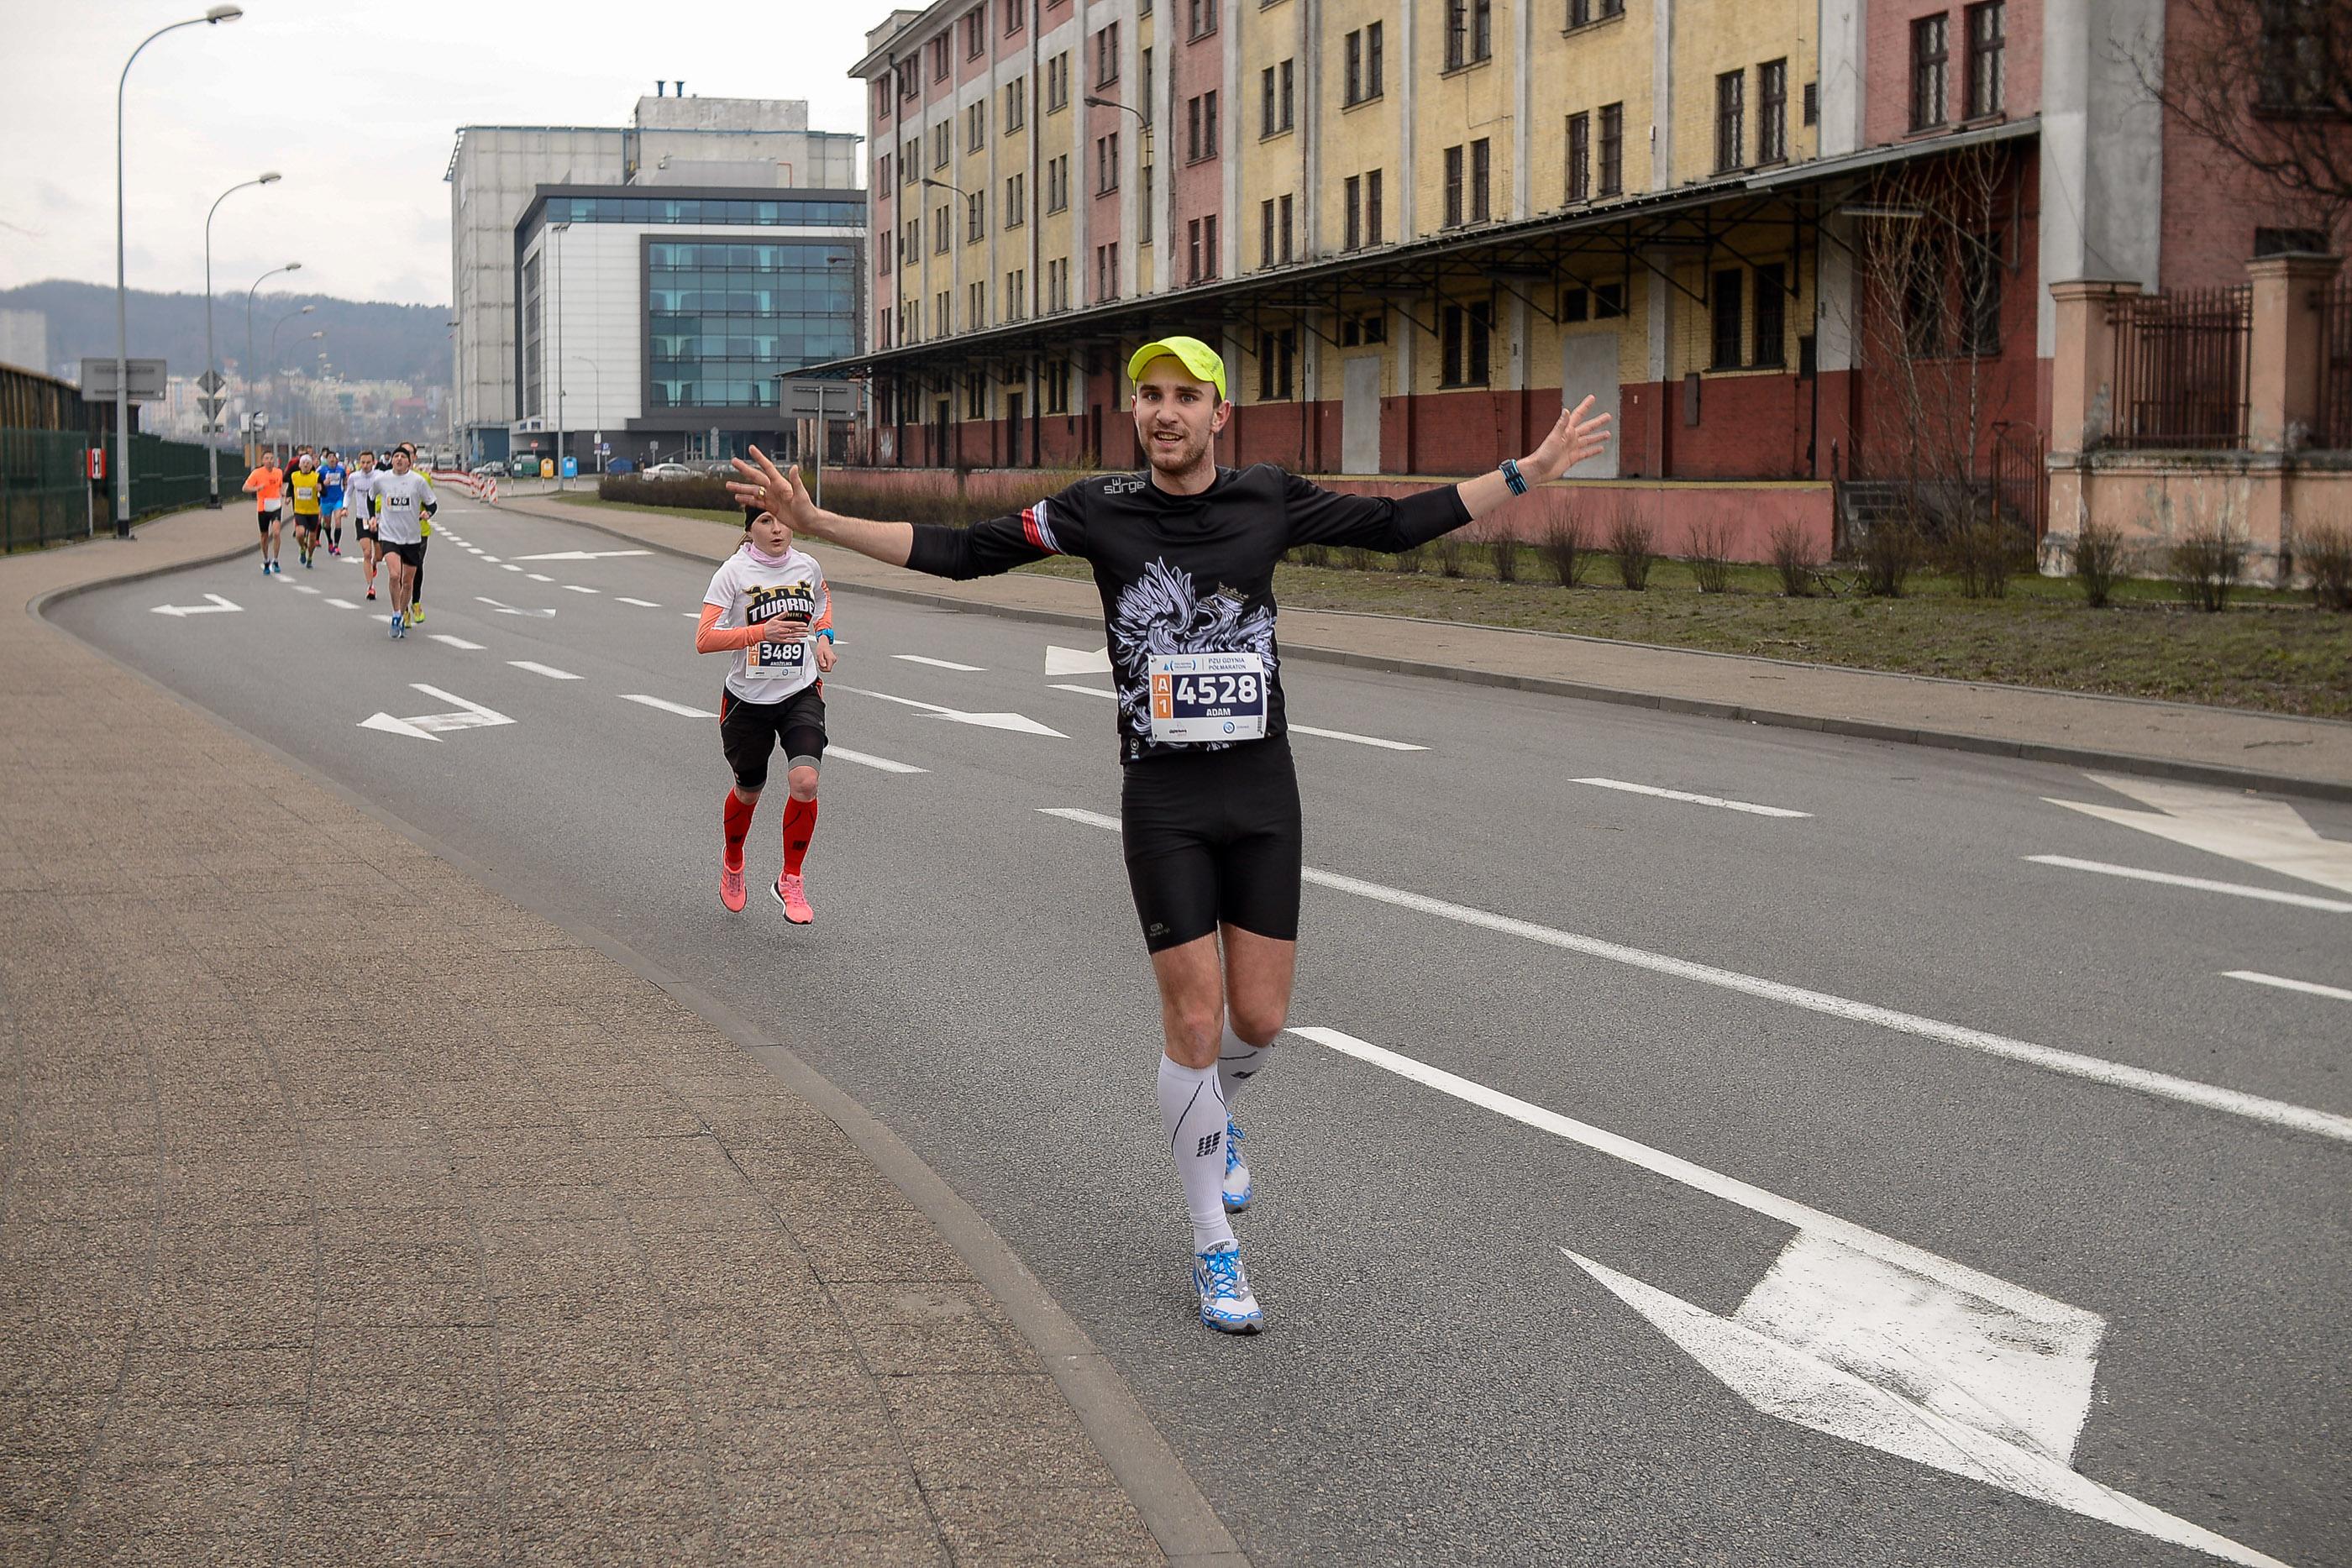 Fot. Joanna Oleszek / maratomania.pl